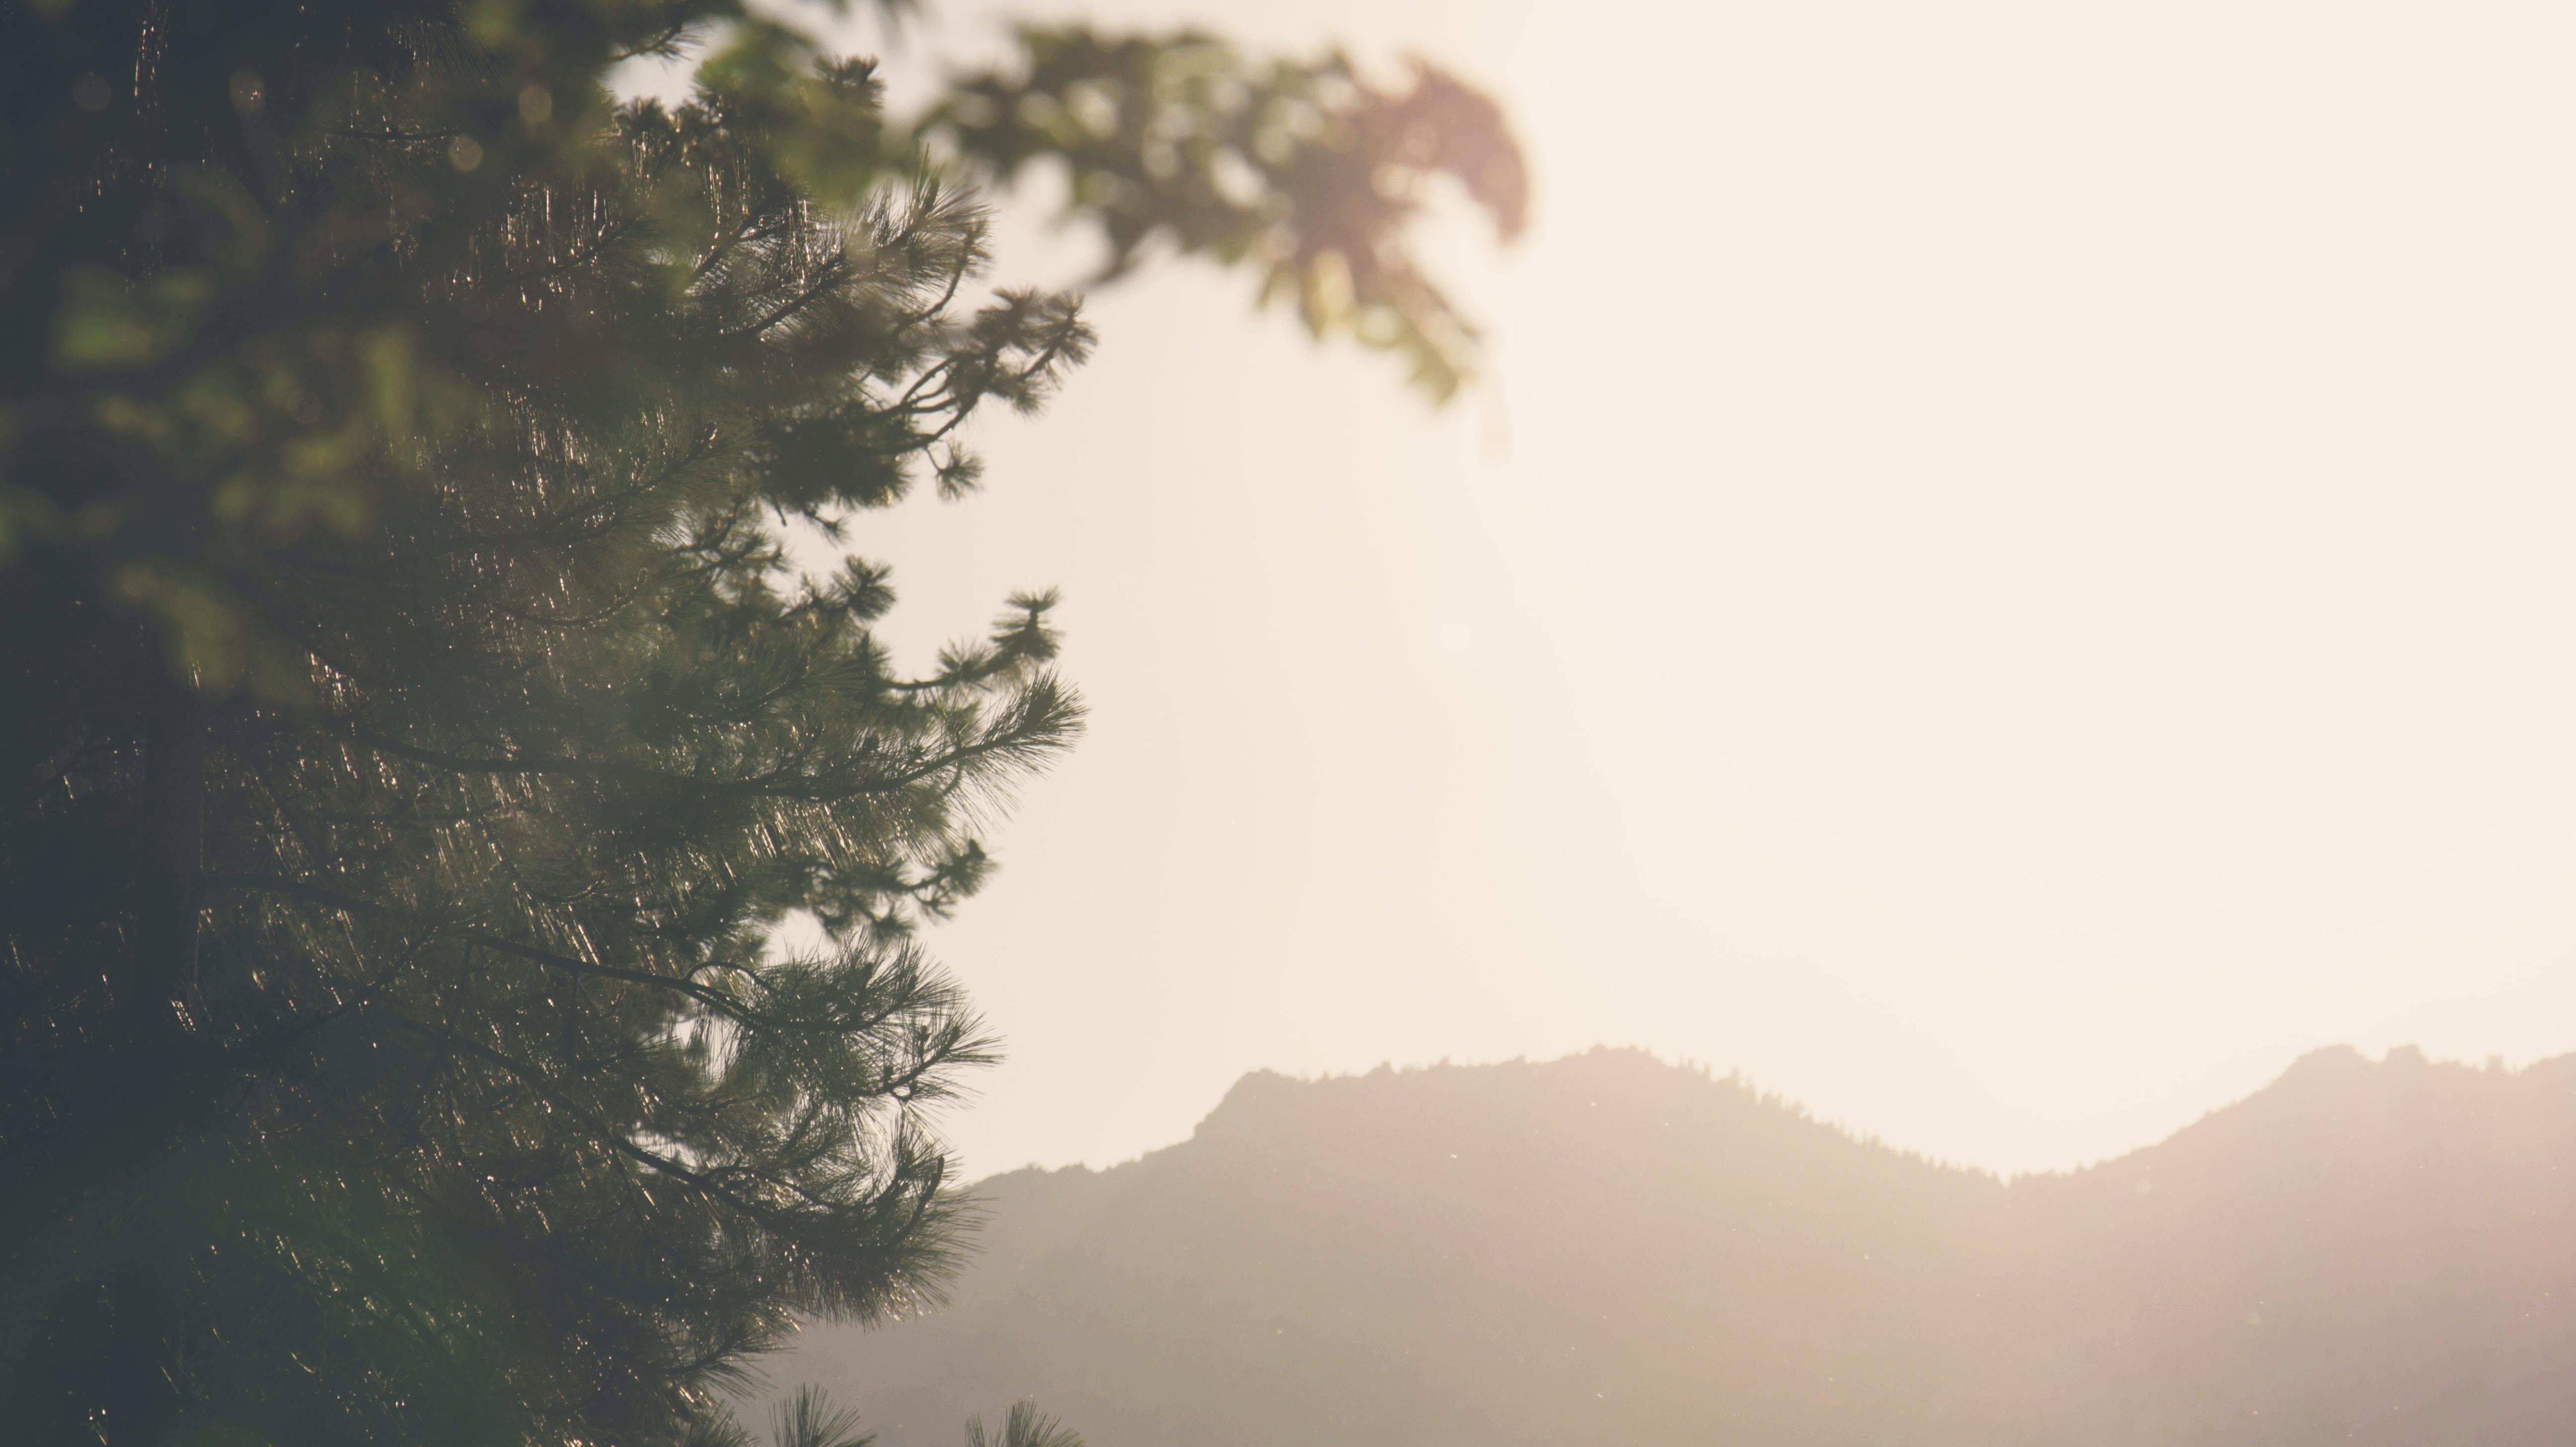 Sun shines over the horizon forming mountain silhouettes